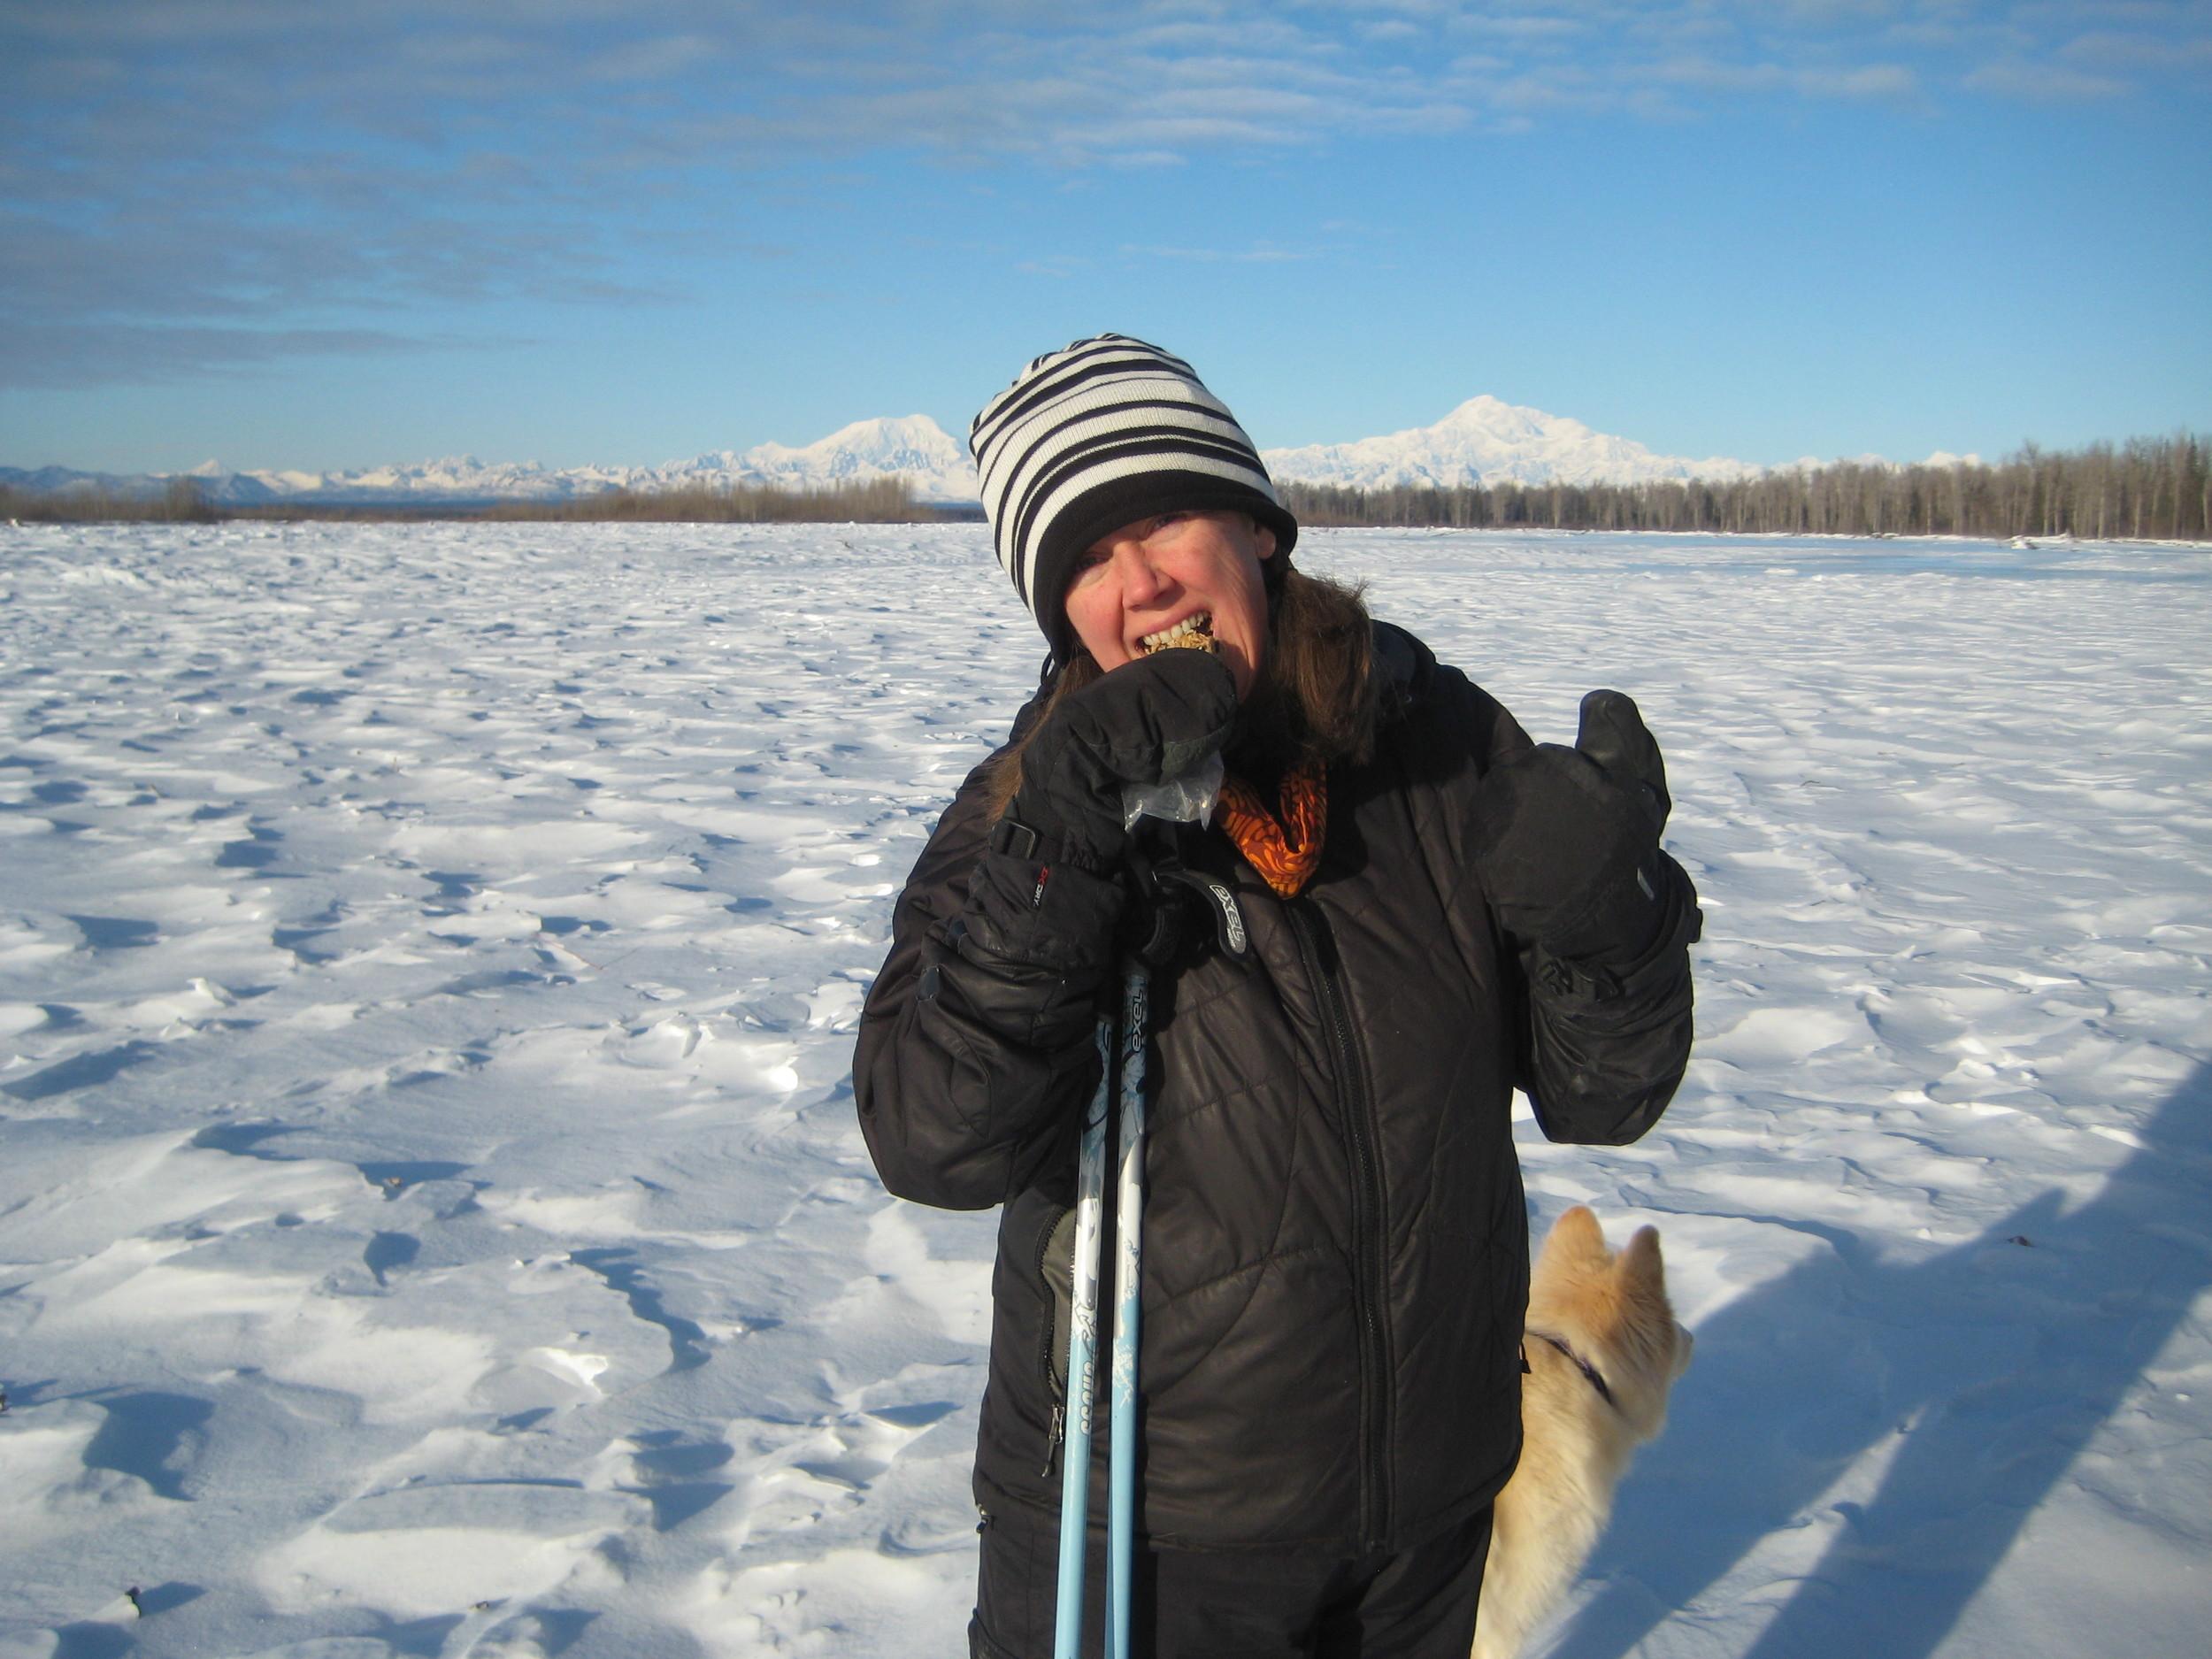 """Delish! Well done! I'm hooked!""- Randi and her dog Kaiya from Talkeetna, Alaska."